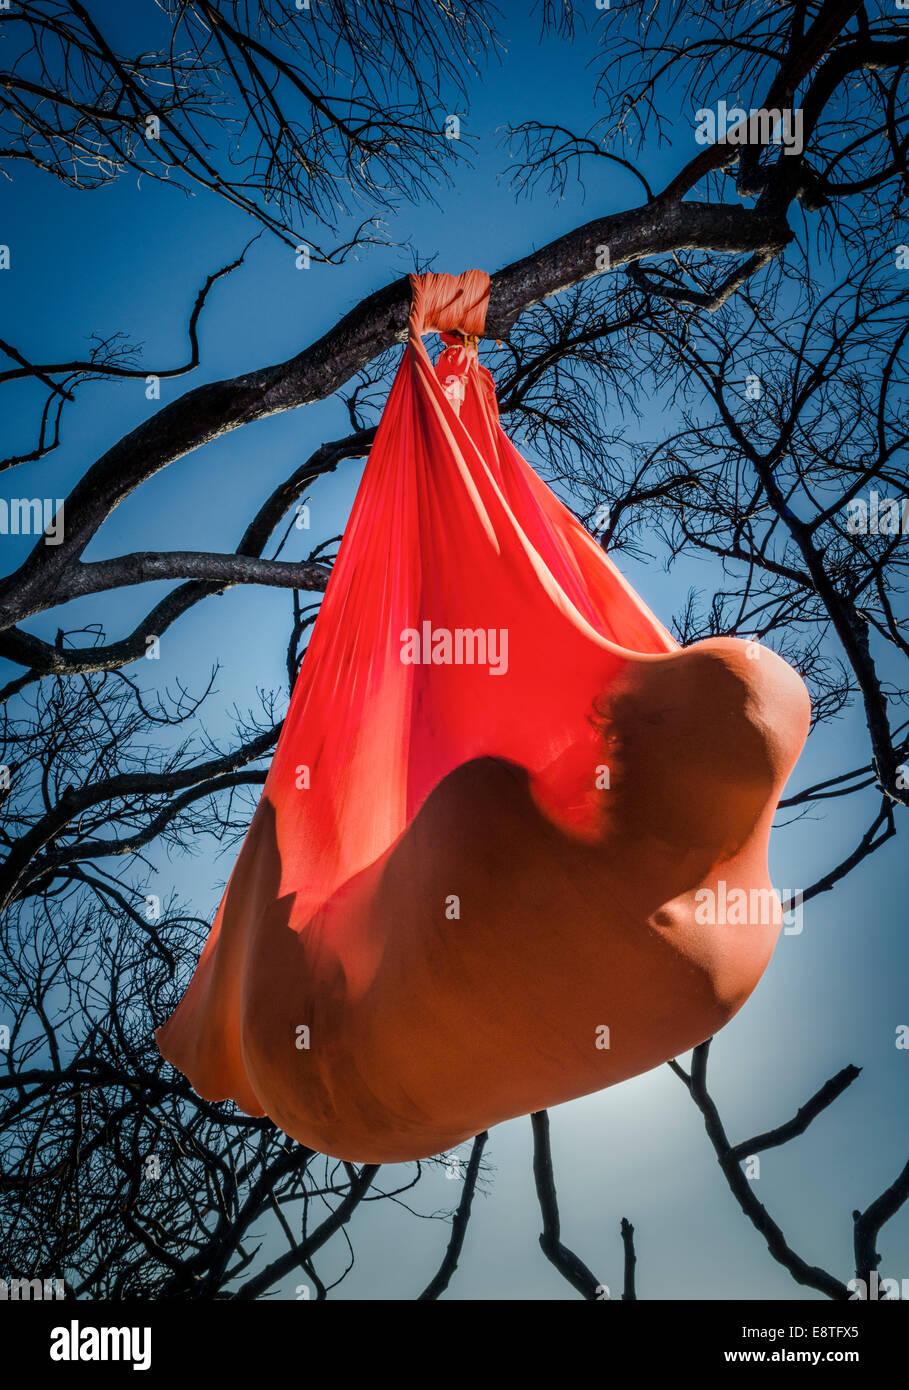 Aero Yoga. Man stretching from a tree. - Stock Image